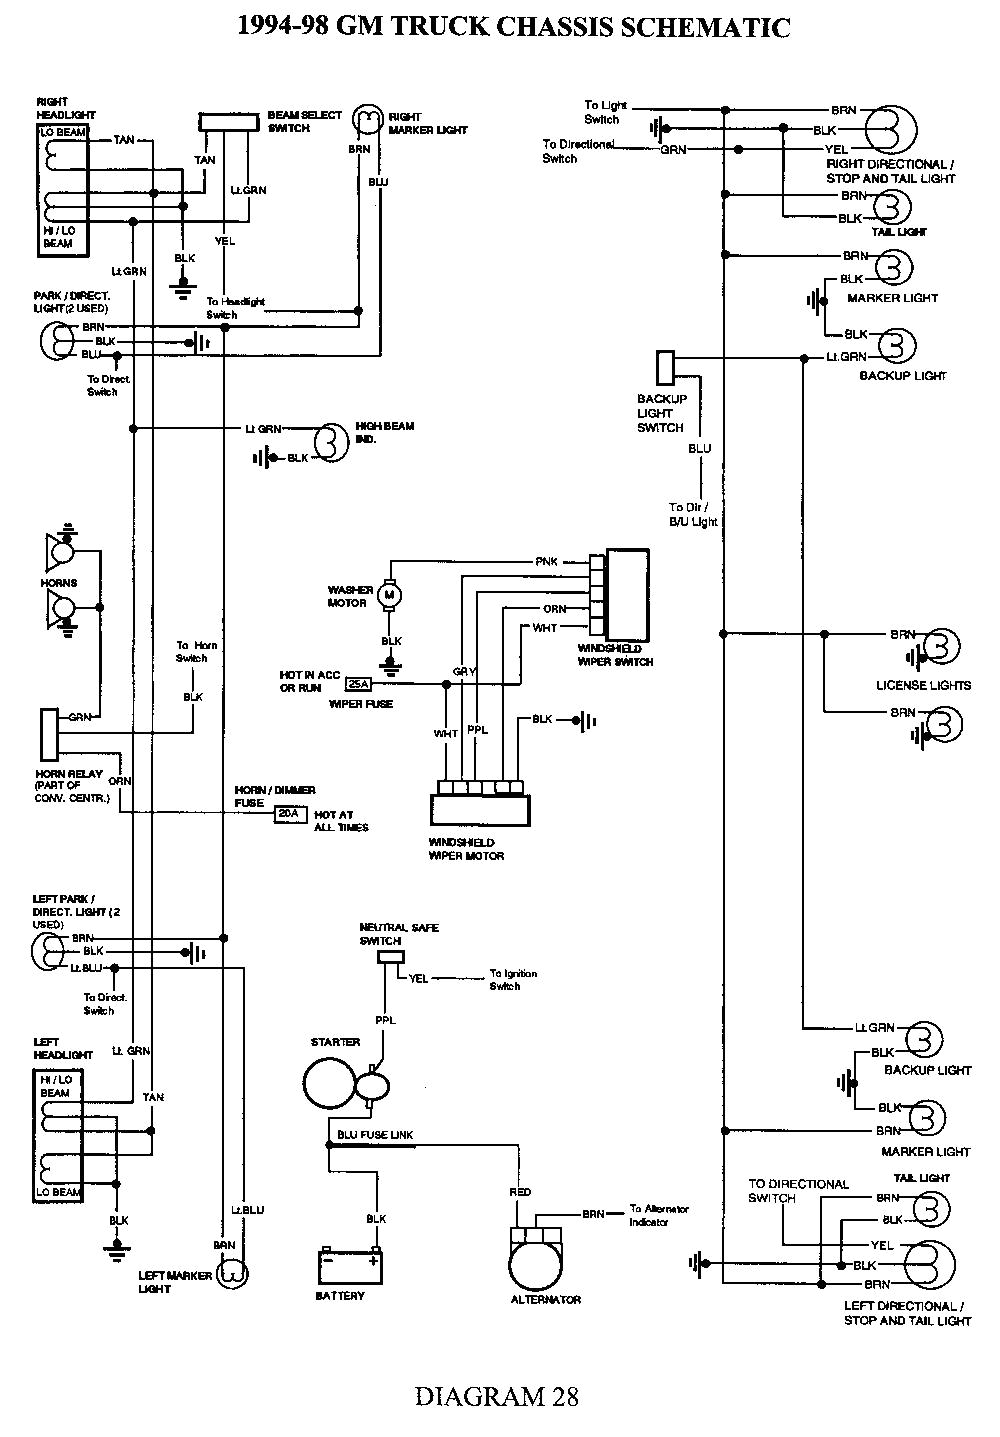 chevy silverado tail light wiring diagram collection types of 2004 chevy silverado tail lights